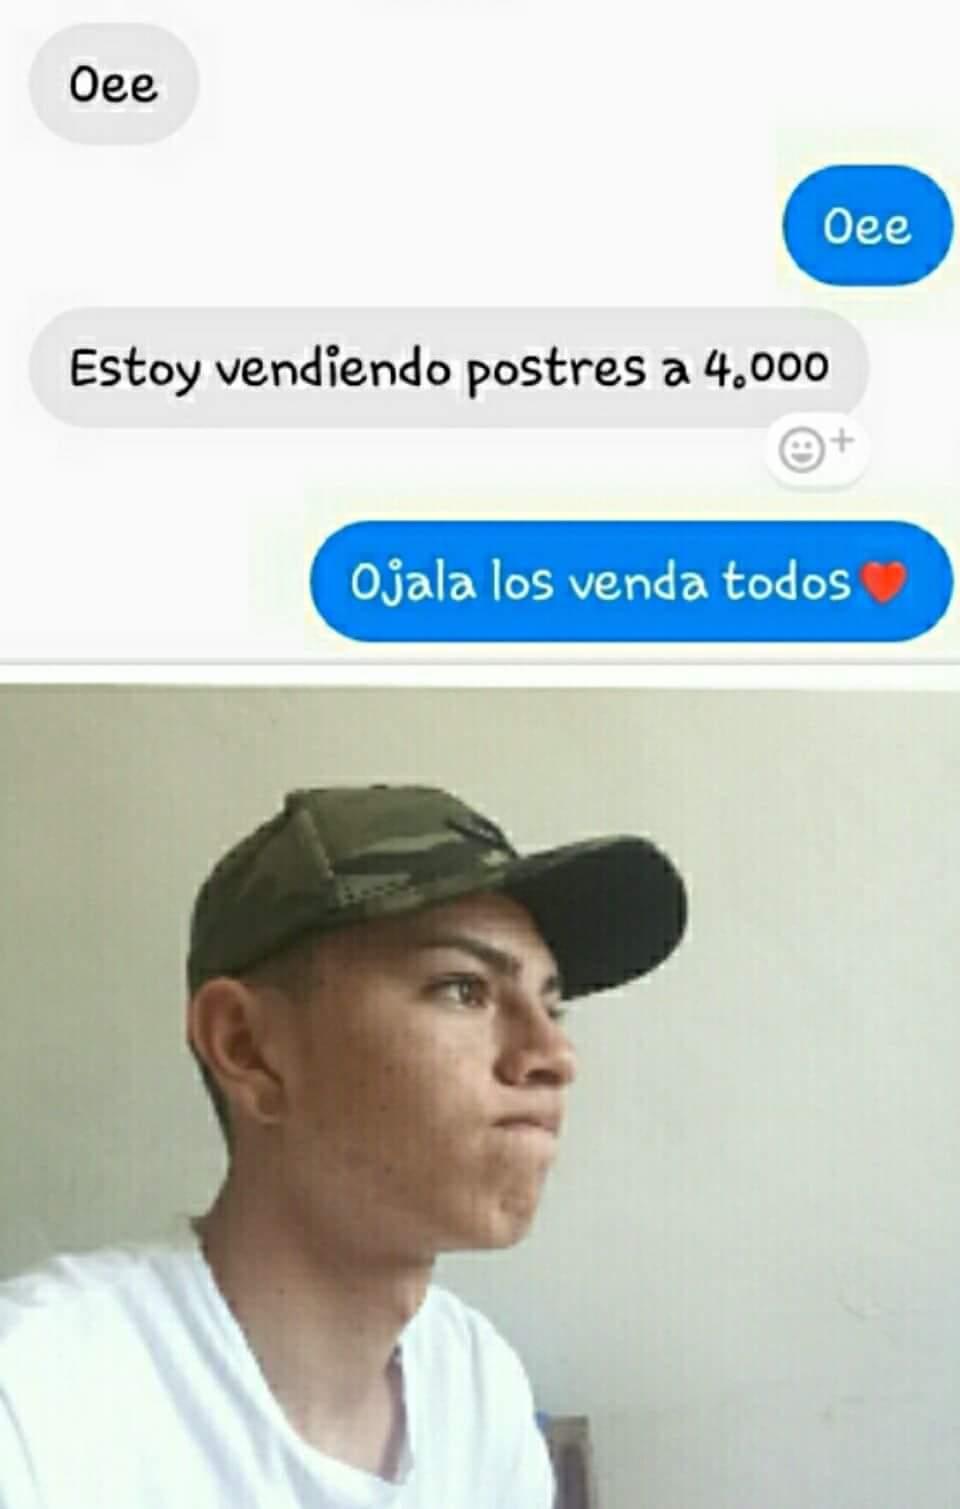 plantilla casera - meme